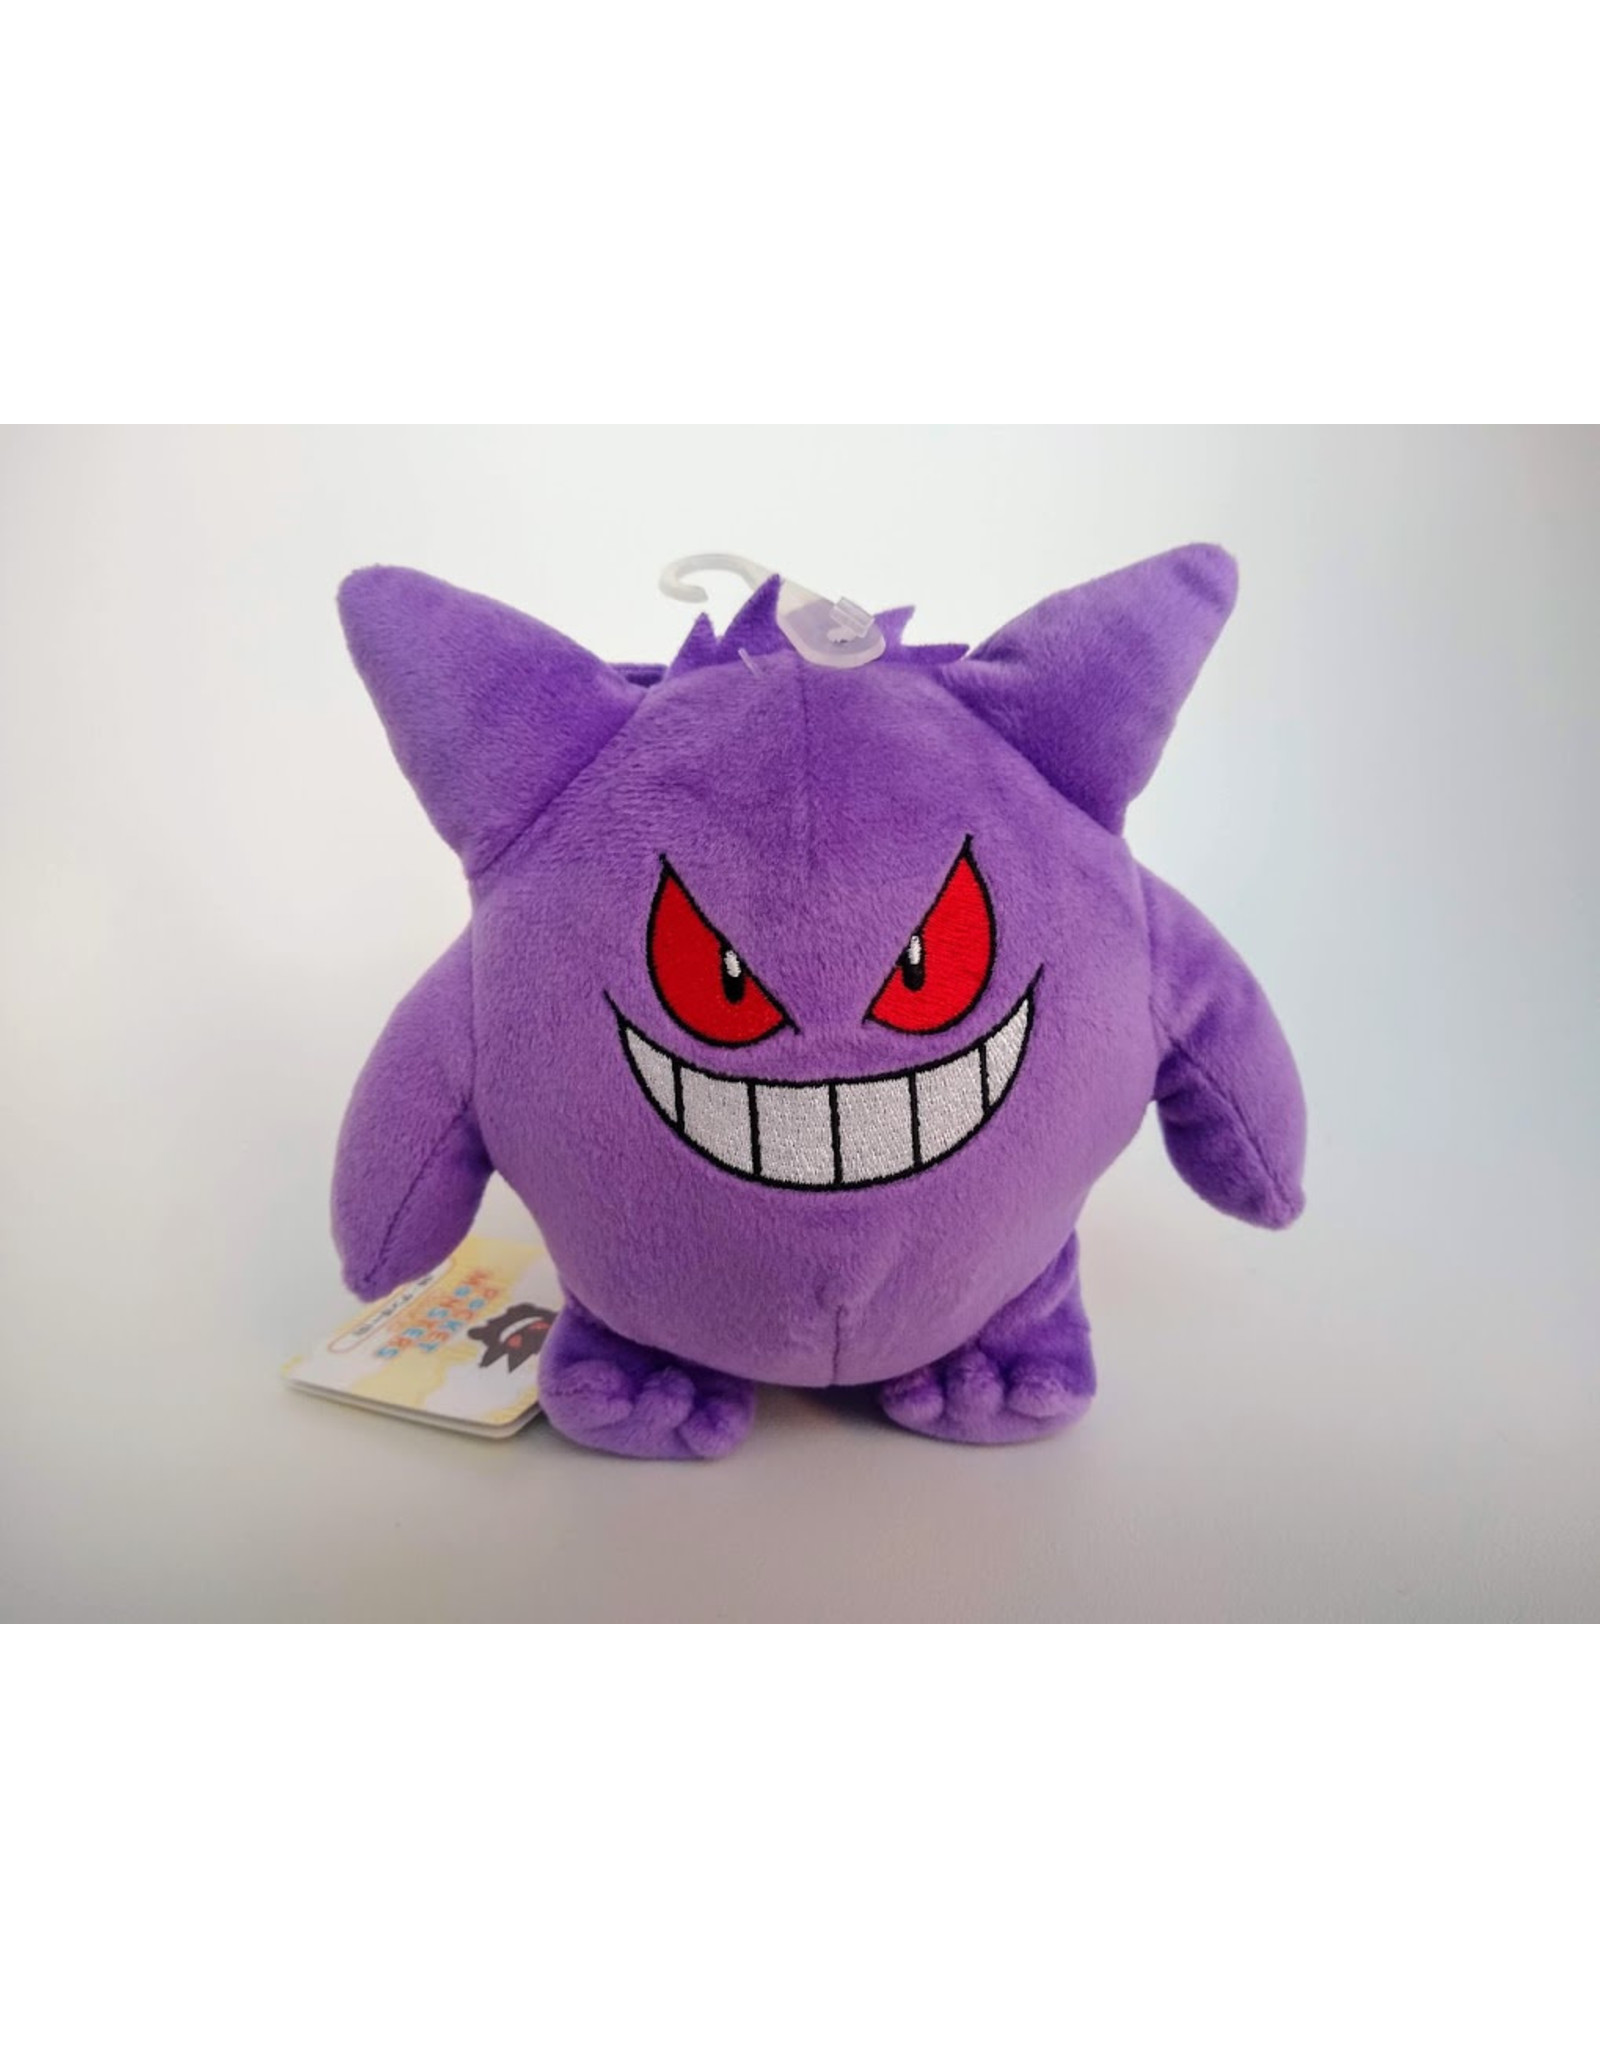 Gengar - Pokemon Plushie - 17cm (Japanese import)